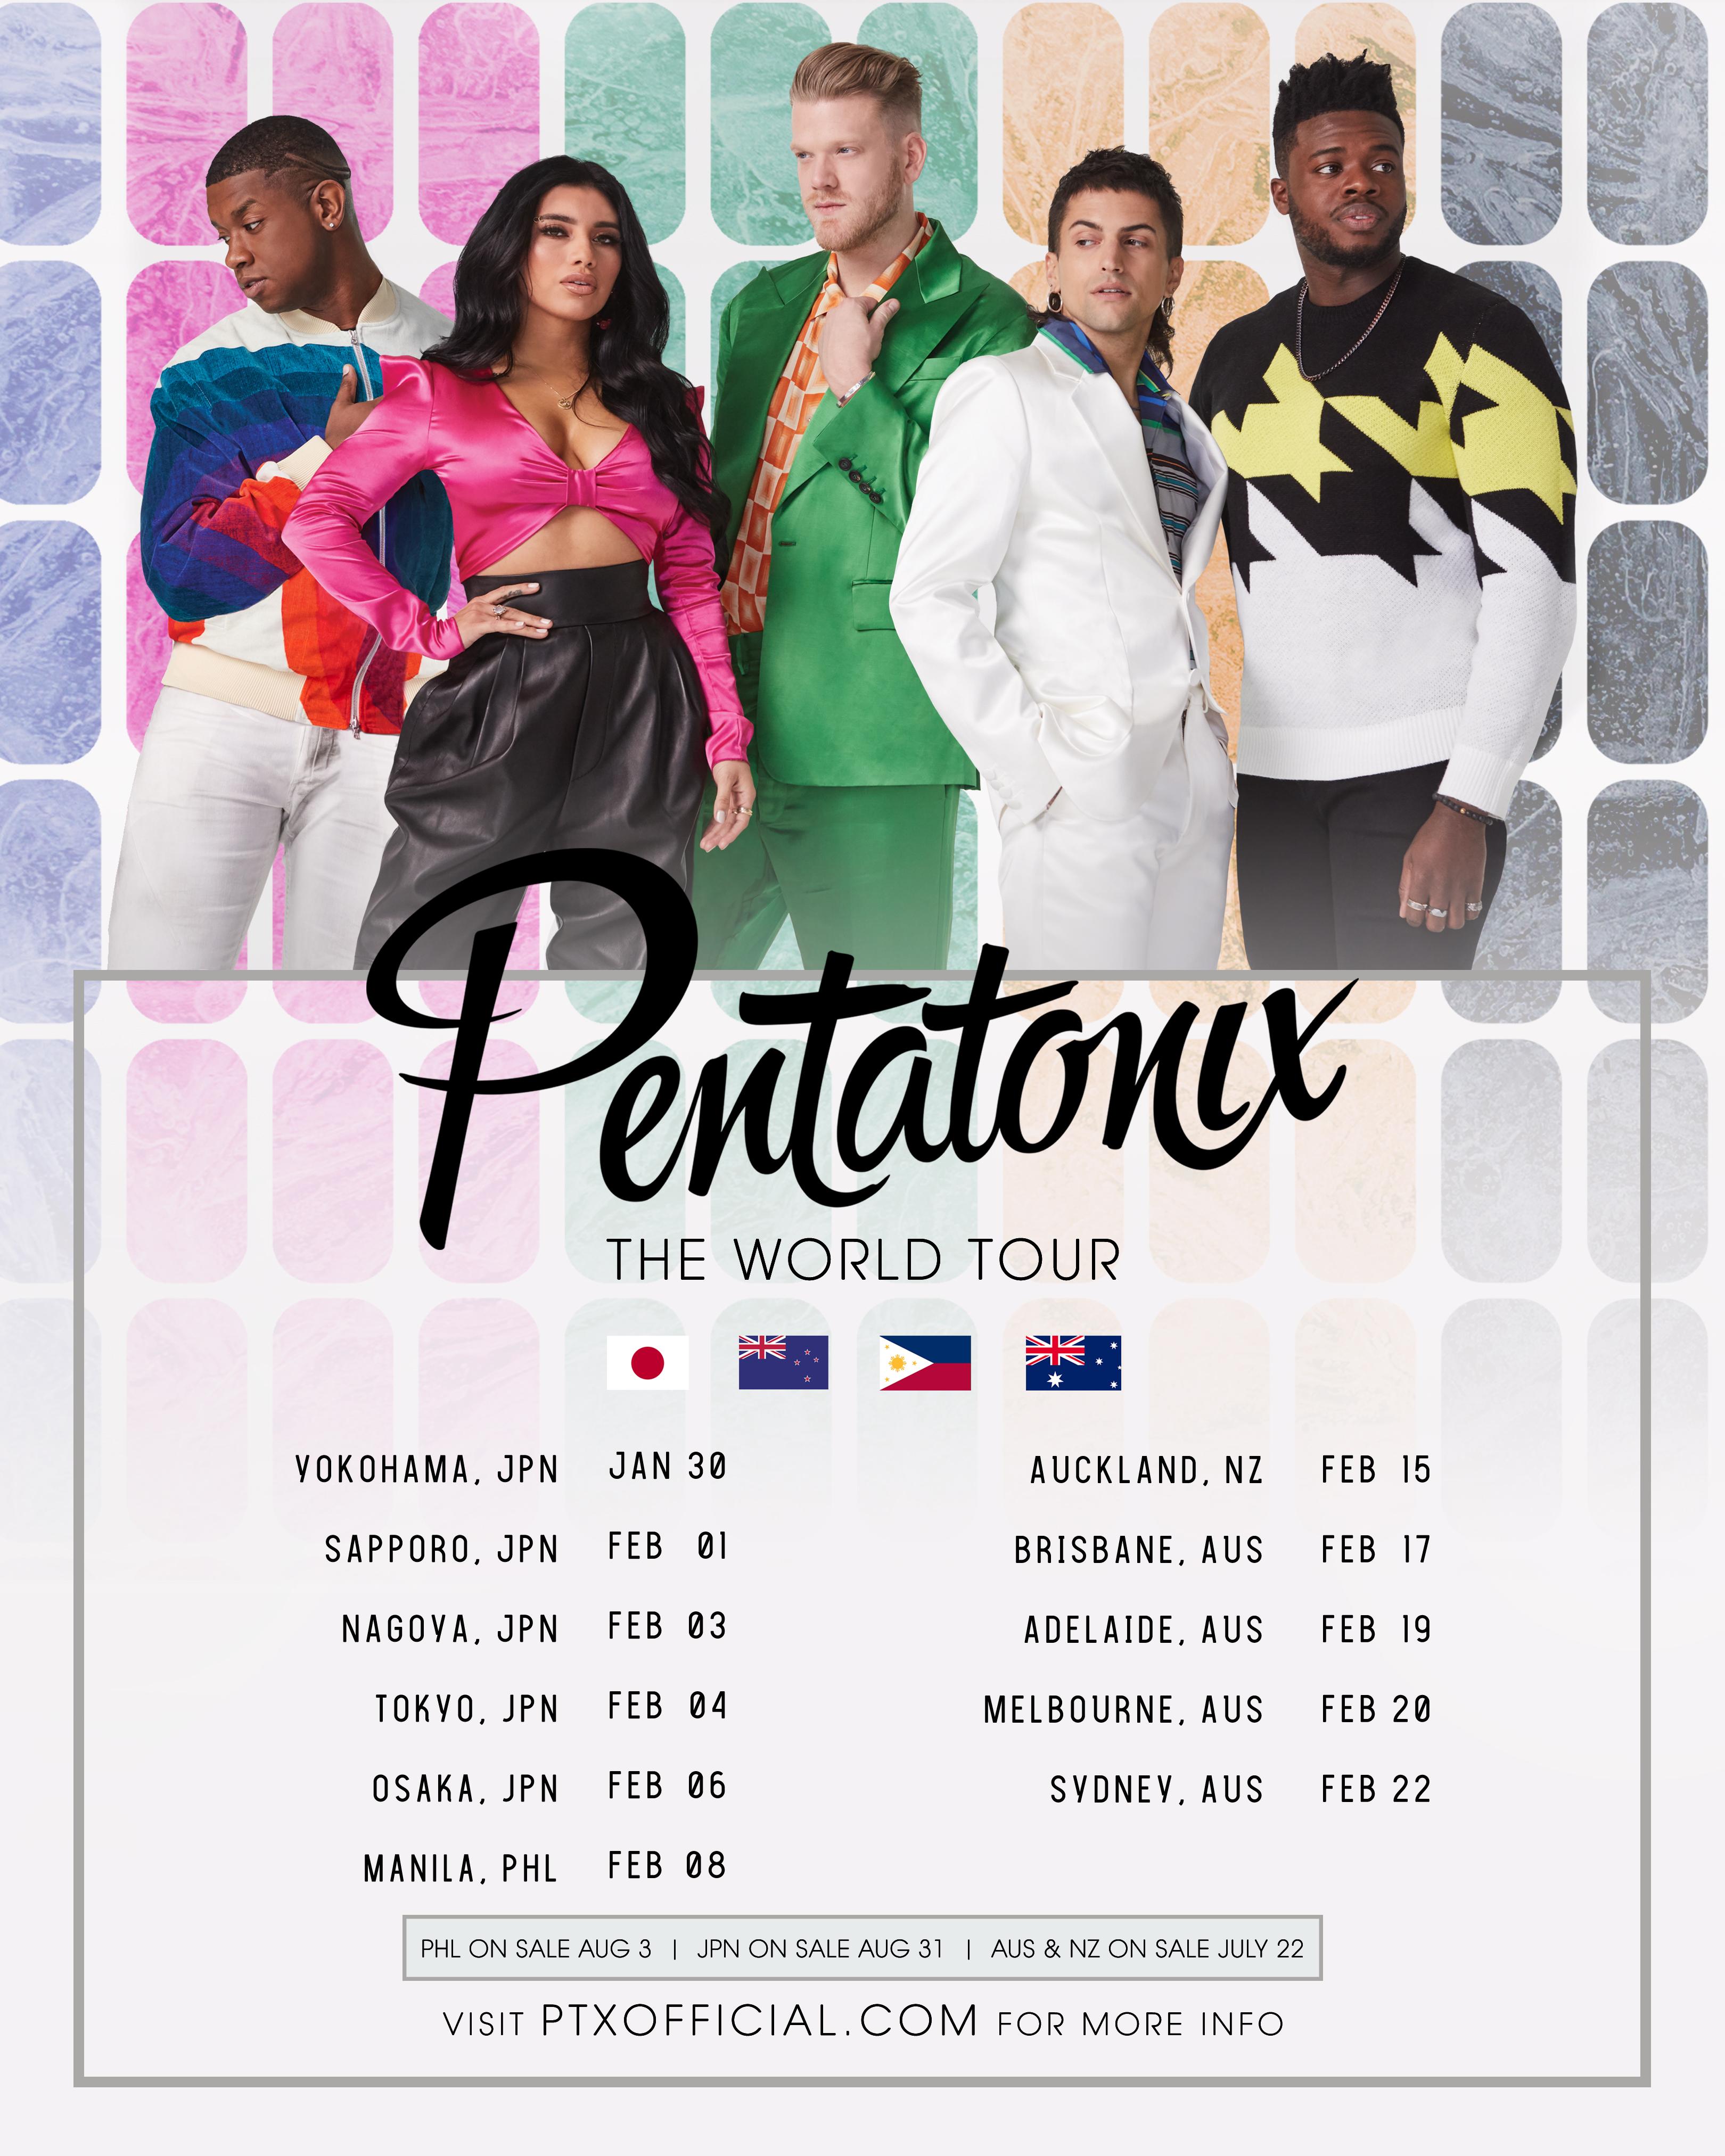 Ptx Tour 2020 PENTATONIX: THE WORLD TOUR IS HEADING TO JAPAN, PHILIPPINES